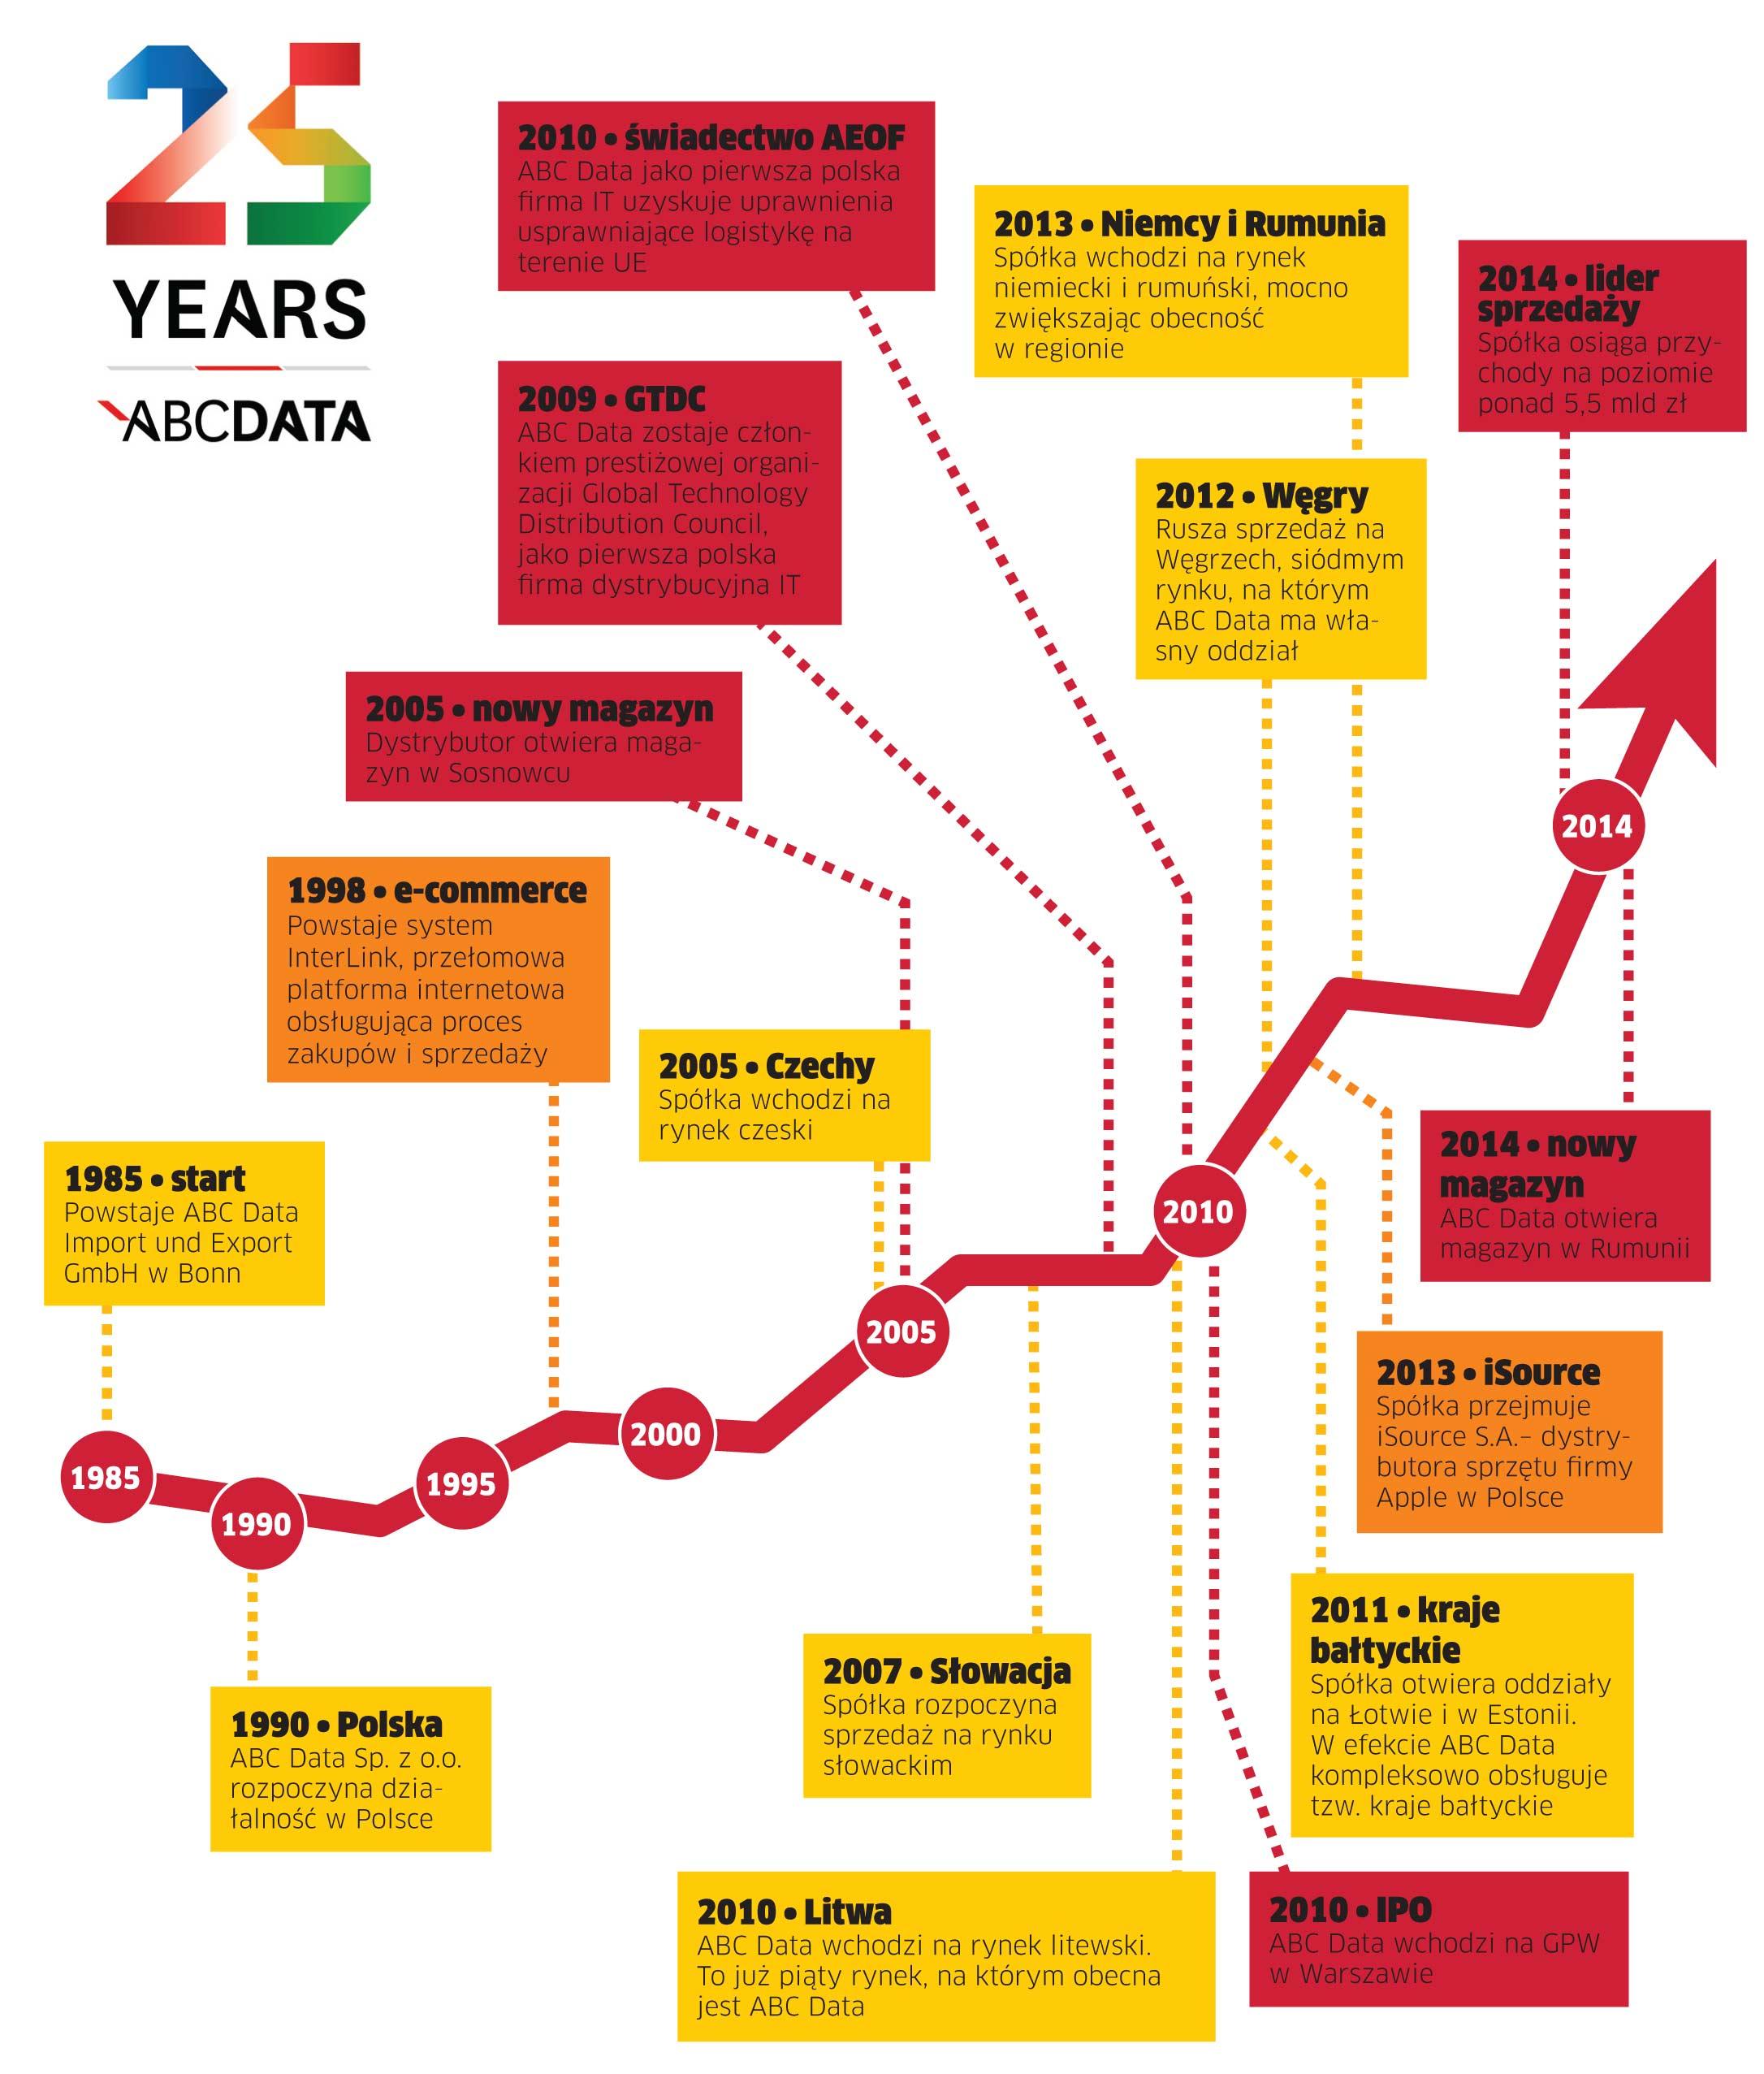 25 lat dystrybucji na rynku IT